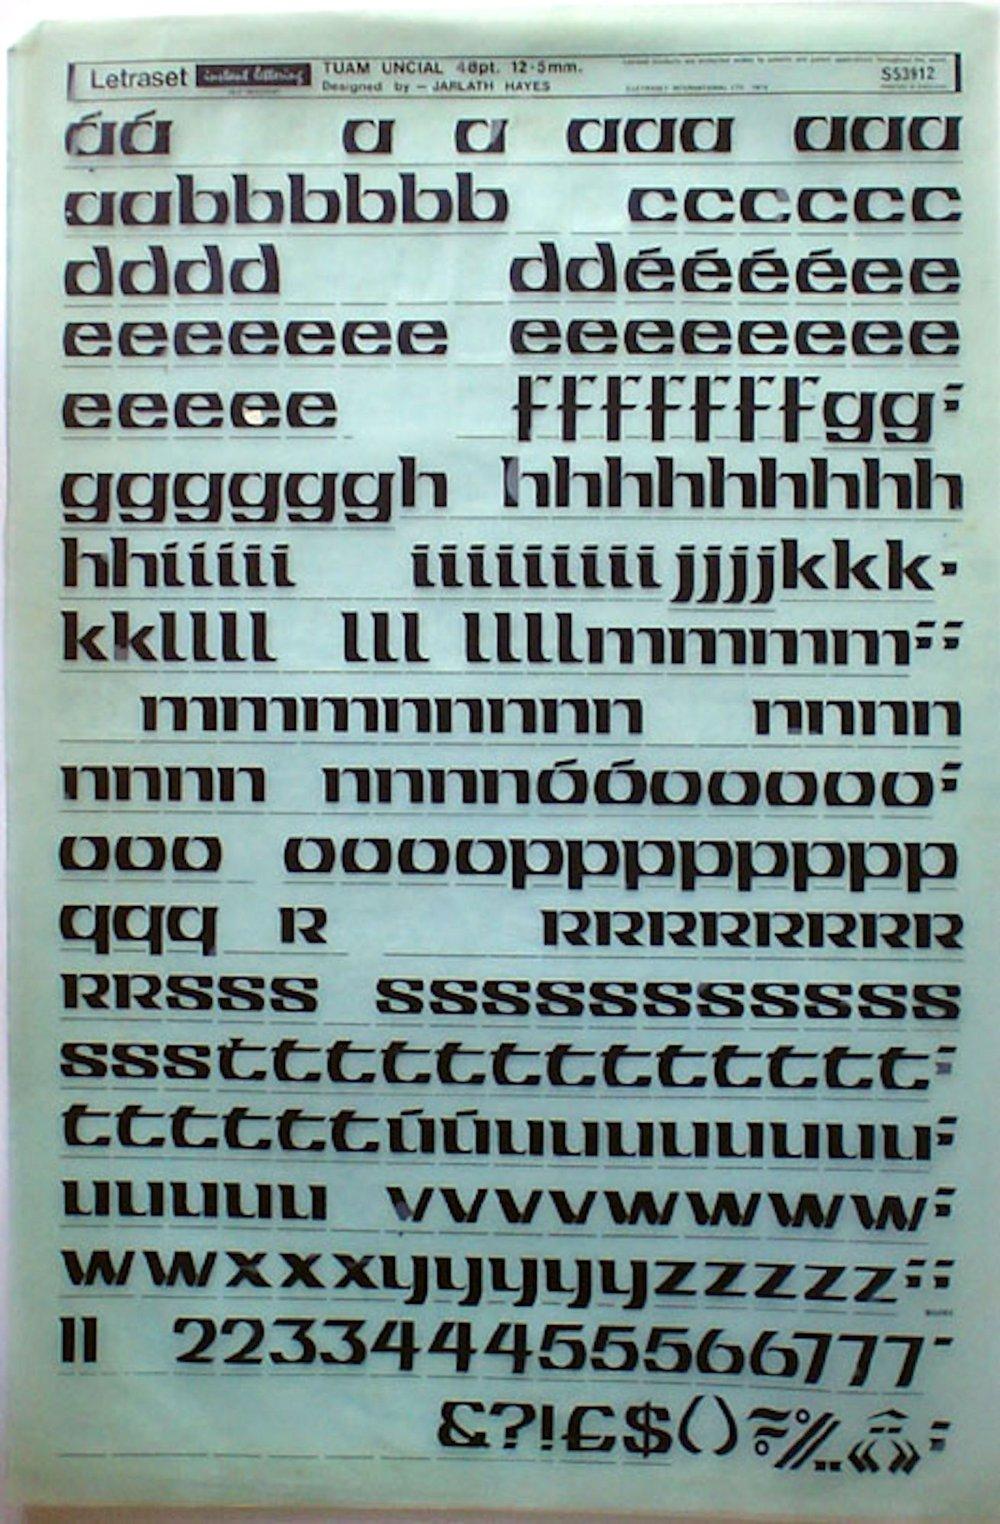 Tuam Uncial Letraset Sheet. Typeface designed by Jarlath Hayes, c.1974-78.